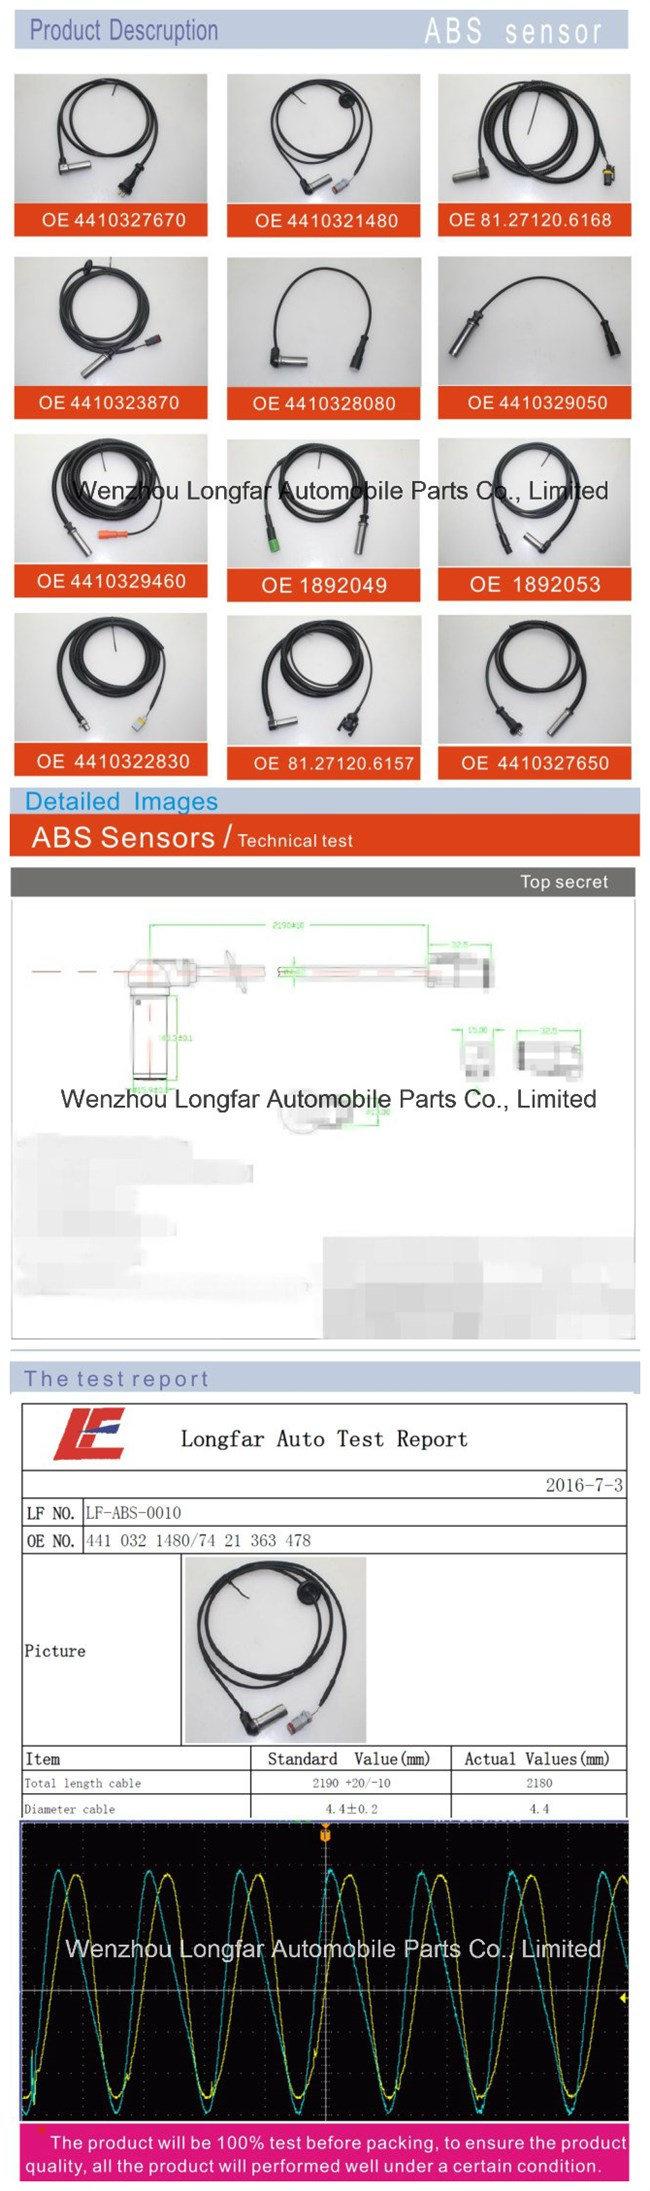 ABS Sensor Anti-Lock Braking System Sensor Transducer Indicator 4410322830 81.27120.6182 81271206119 12-34 899 0005 3.37111 4410322960 for Man Truck